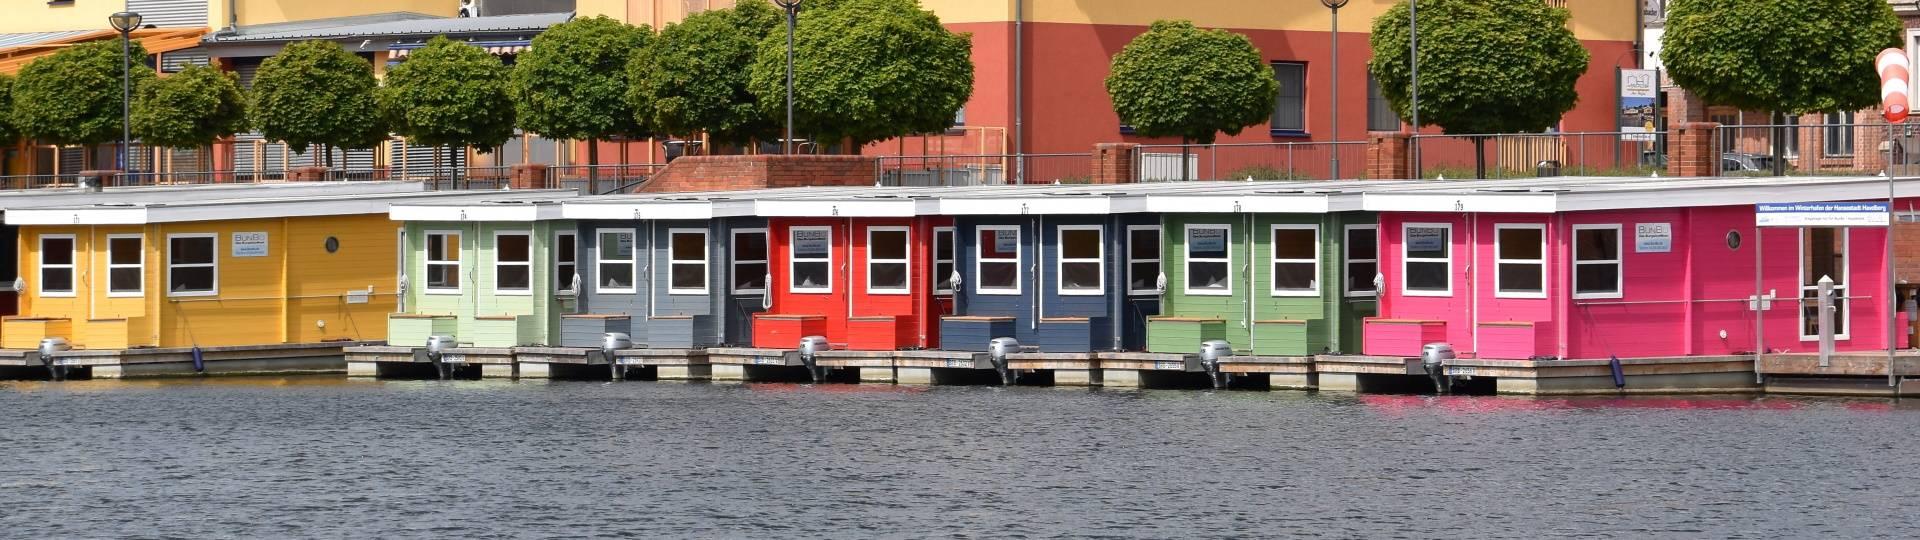 hausboote ©Hansestadt Havelberg